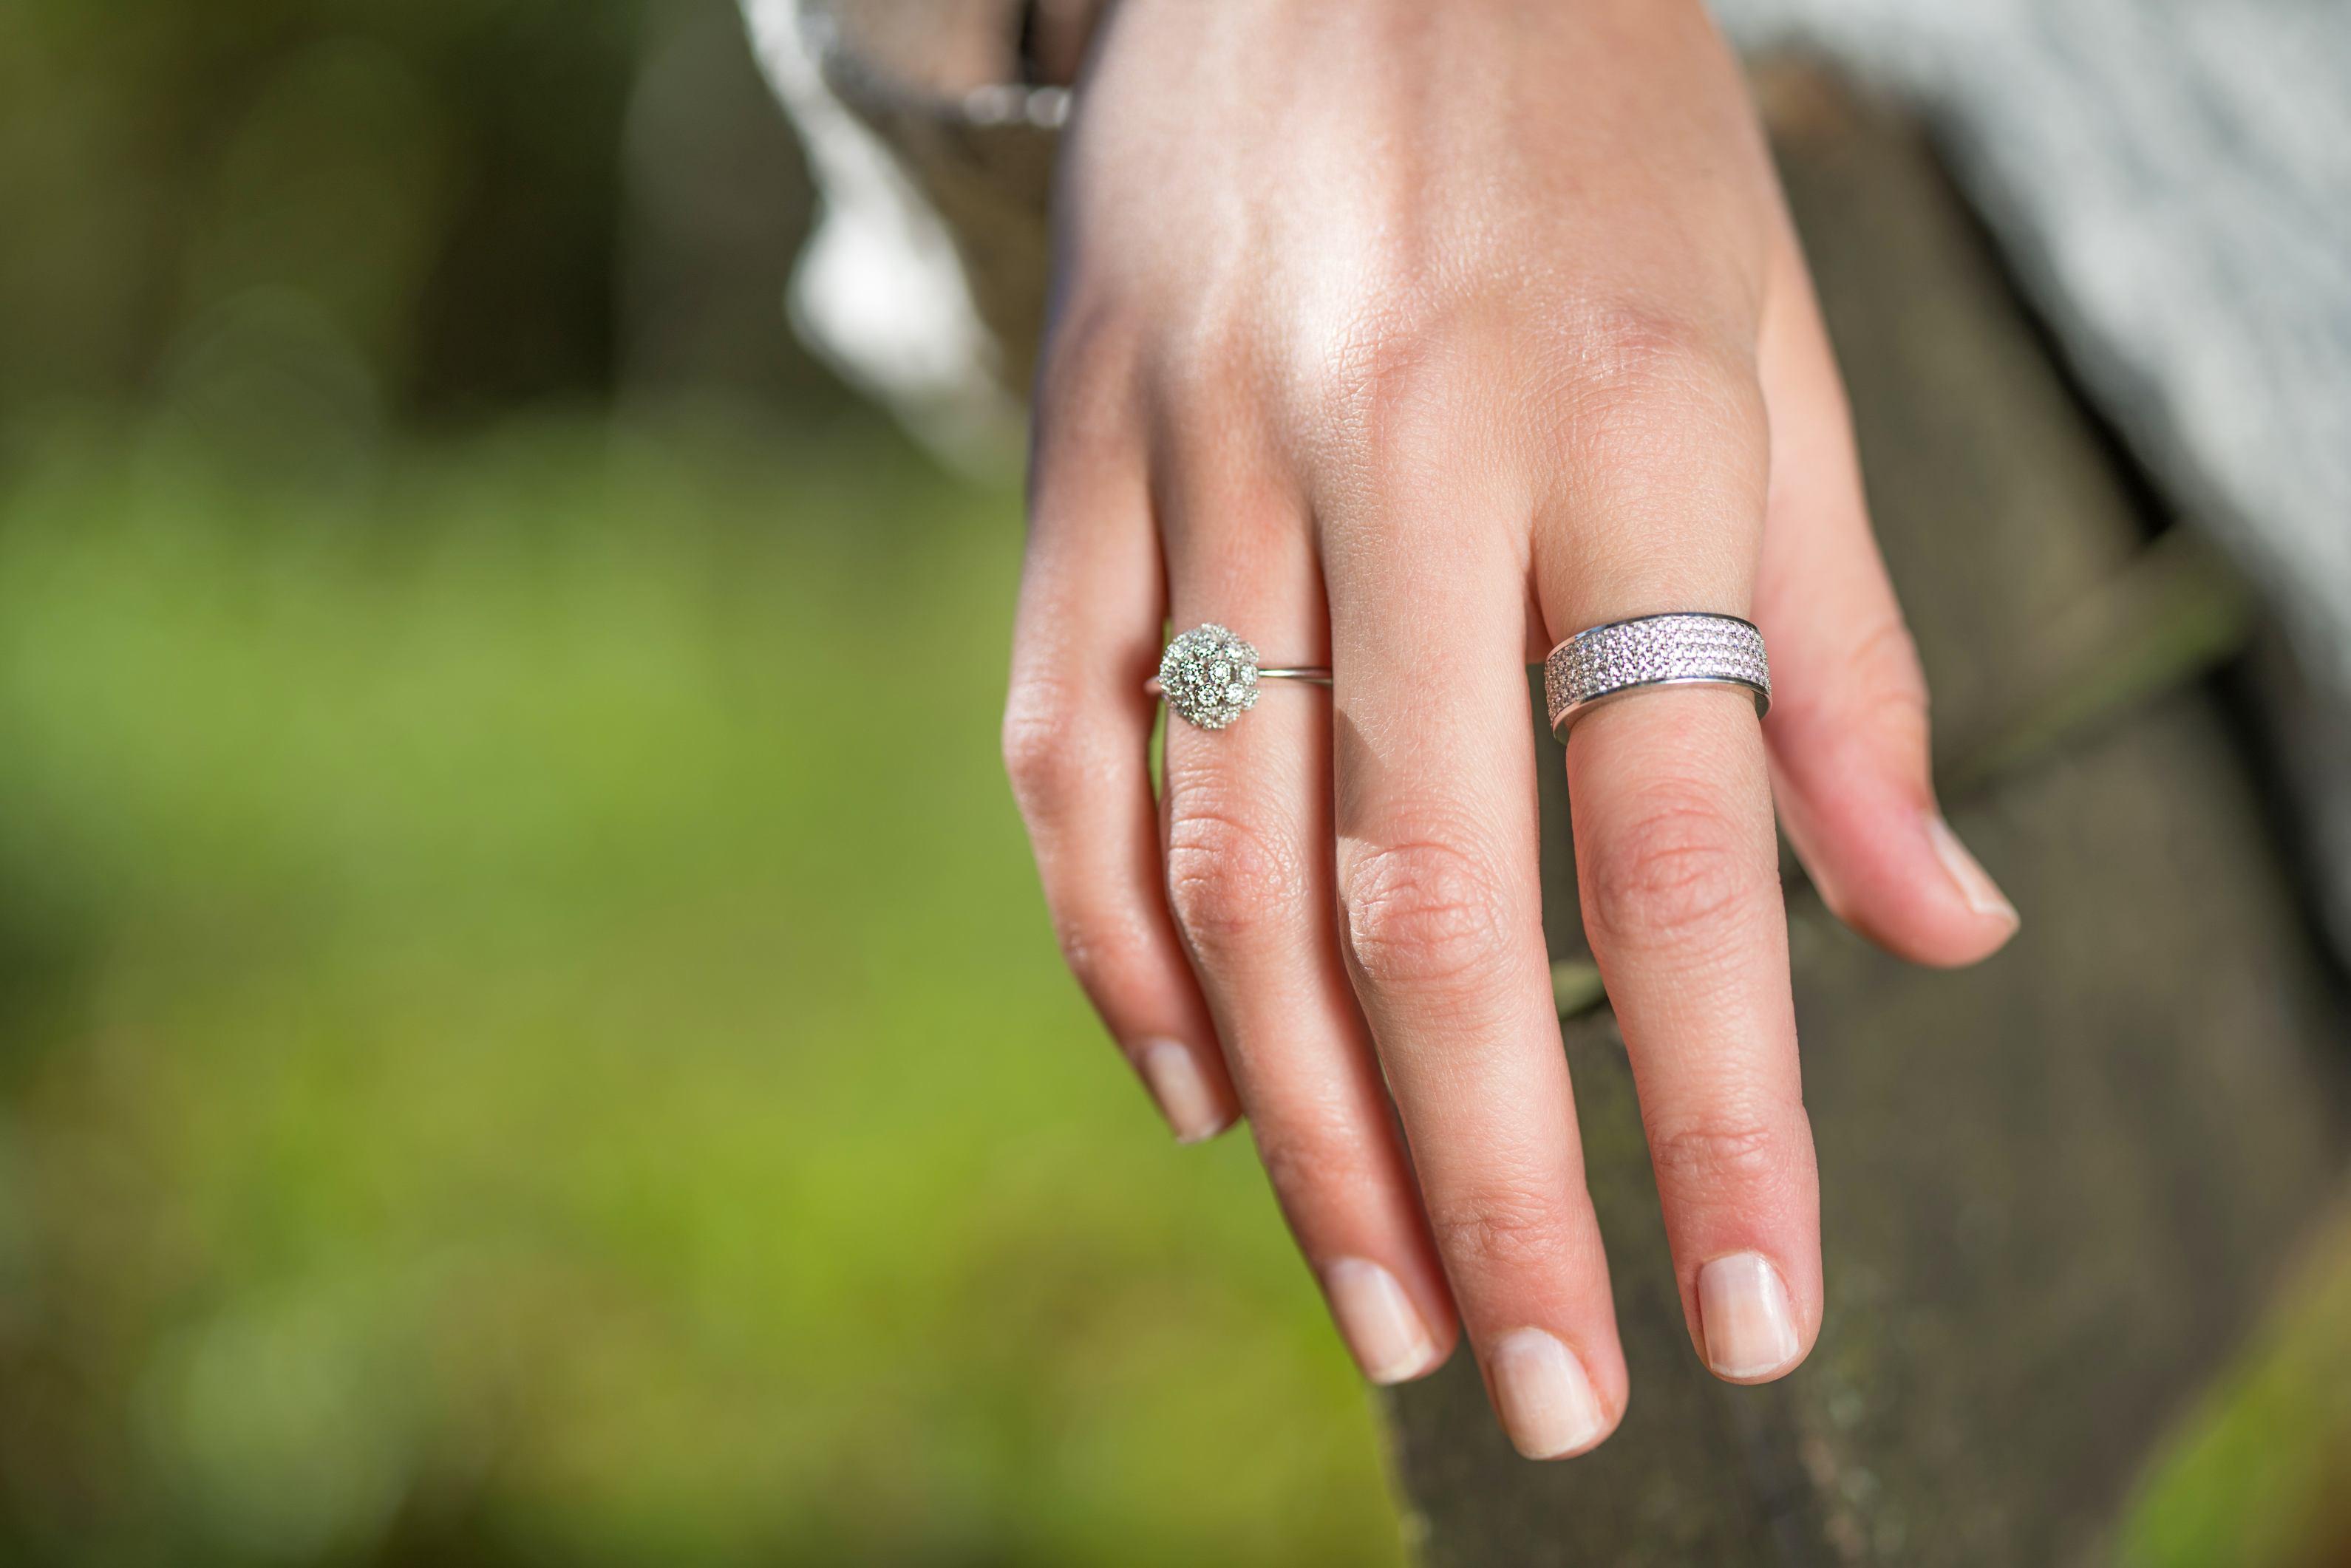 Desni srebrni prsten_270kn_lijevi srebrni prsten 760kn_Argentum